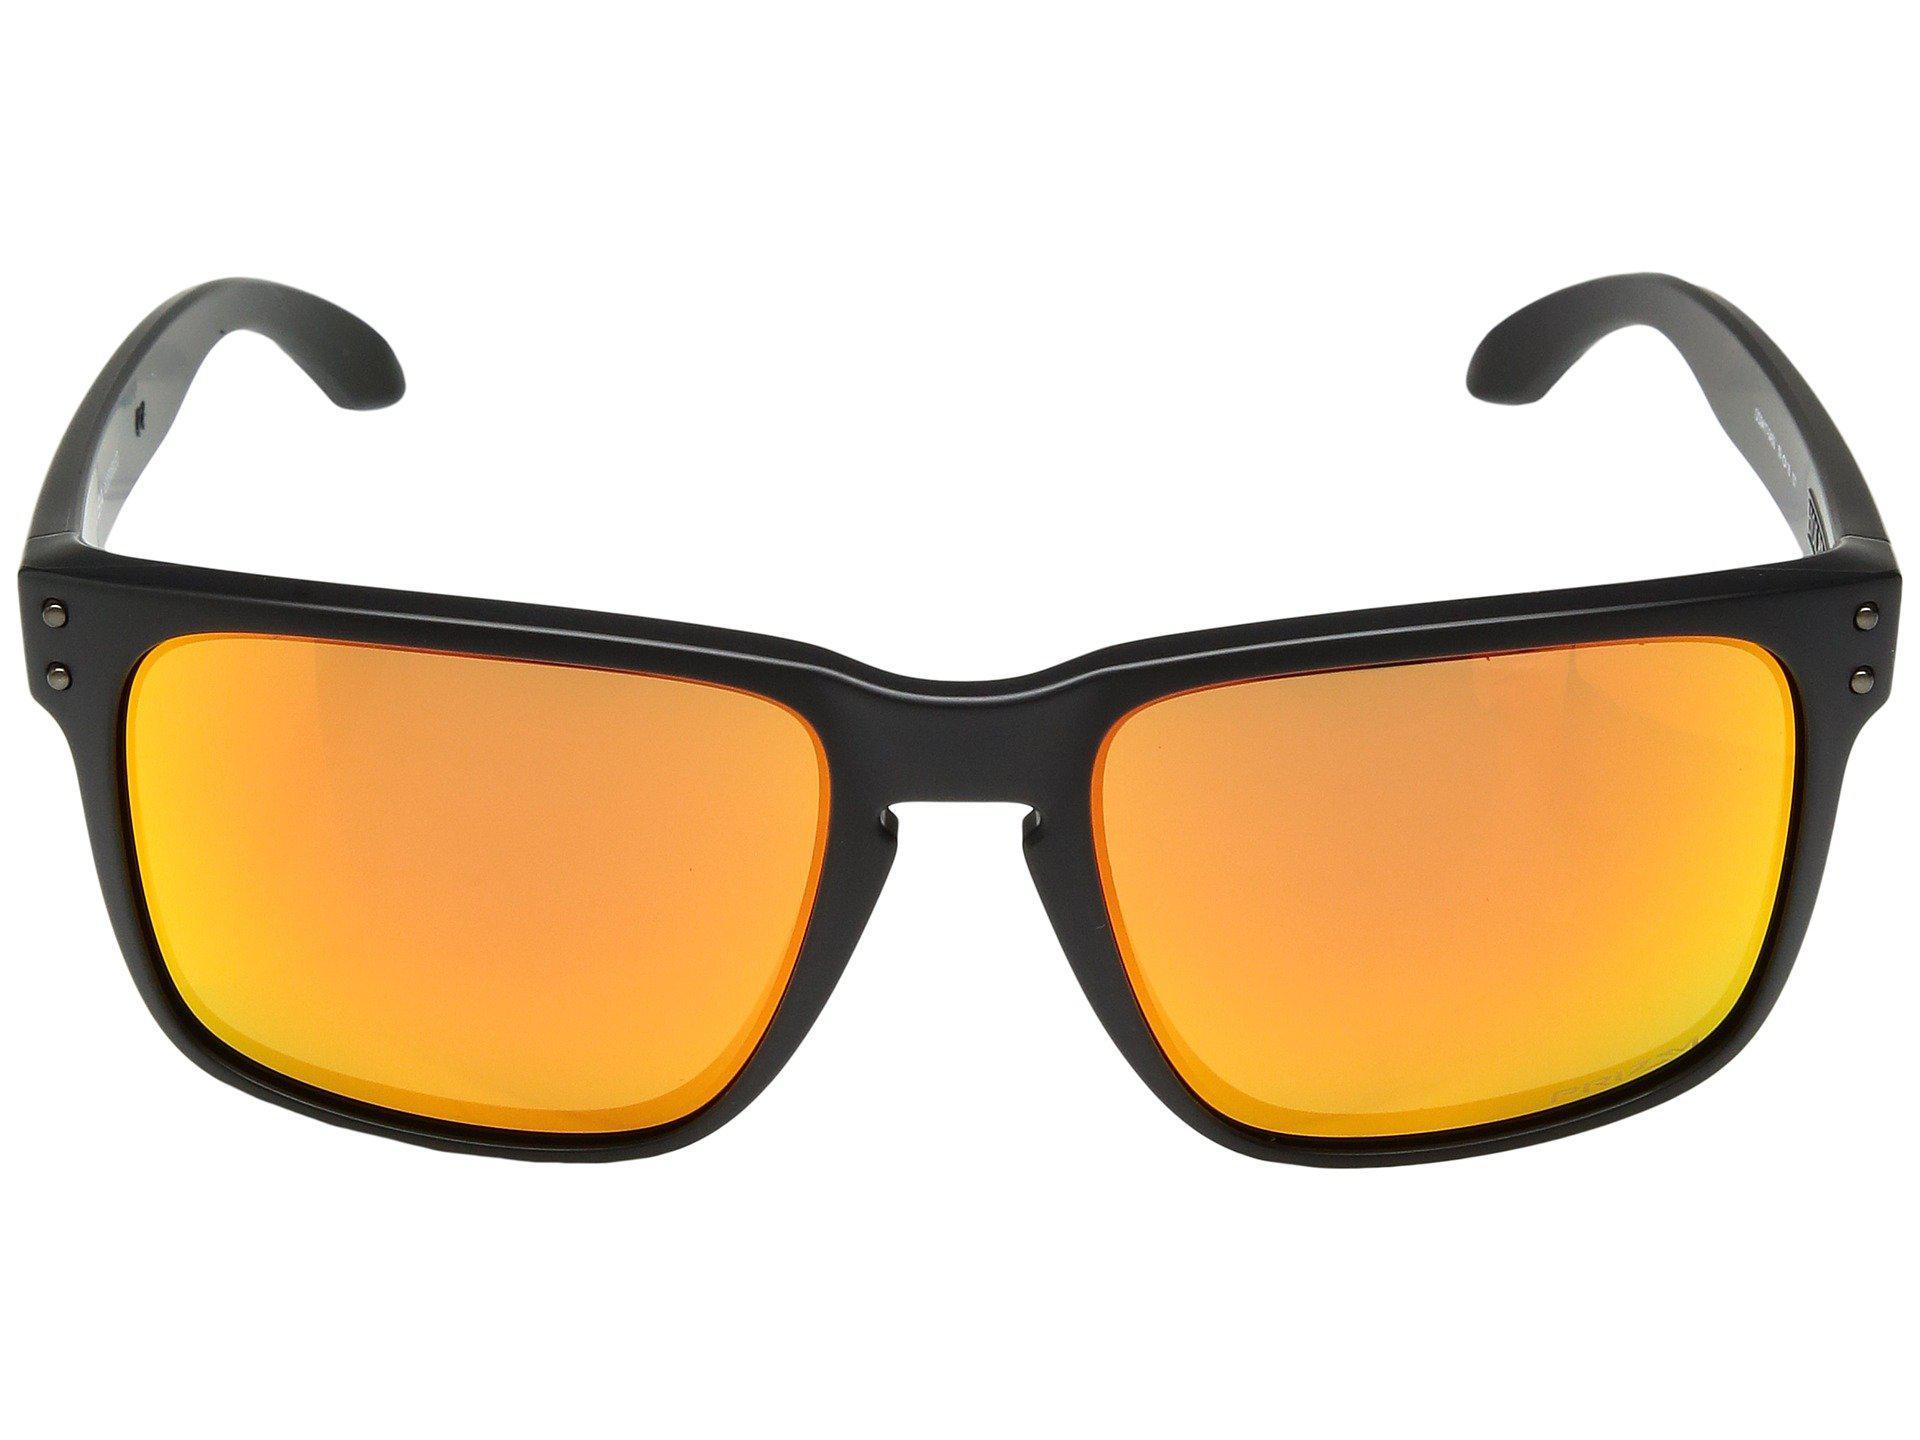 9ba86bdf367 Oakley - Holbrook Xl (matte Black W  Warm Grey) Athletic Performance Sport  Sunglasses. View fullscreen